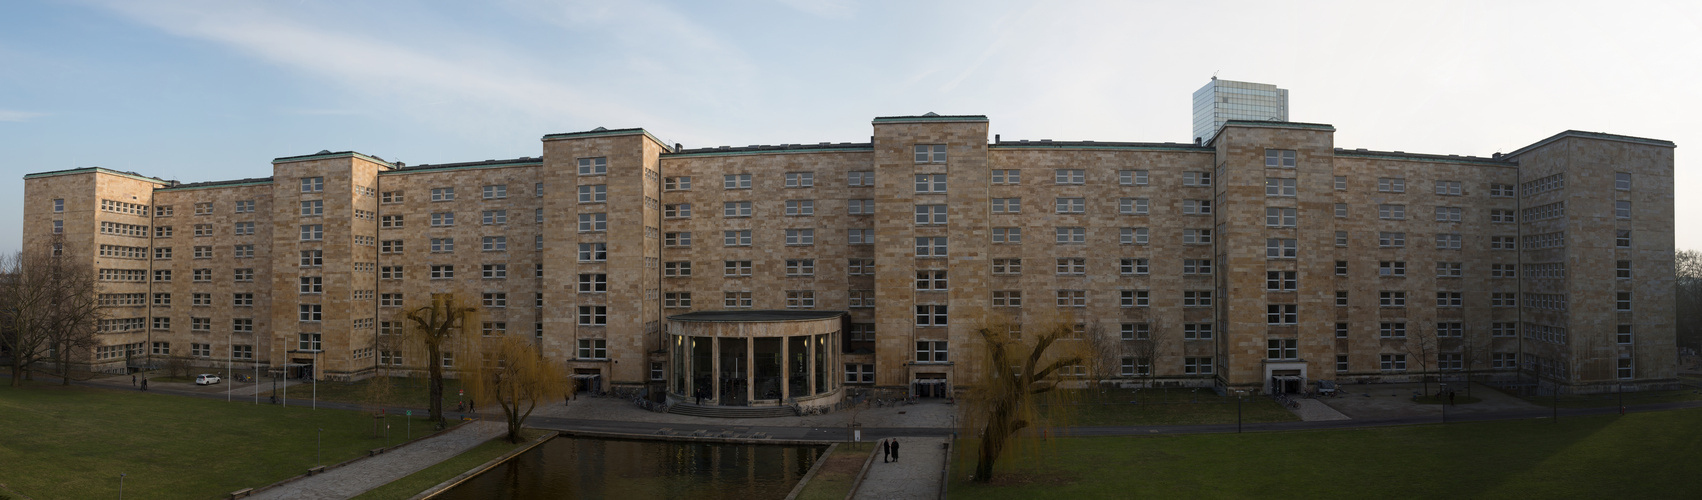 Frankfurt - I.G.-Farben-Haus